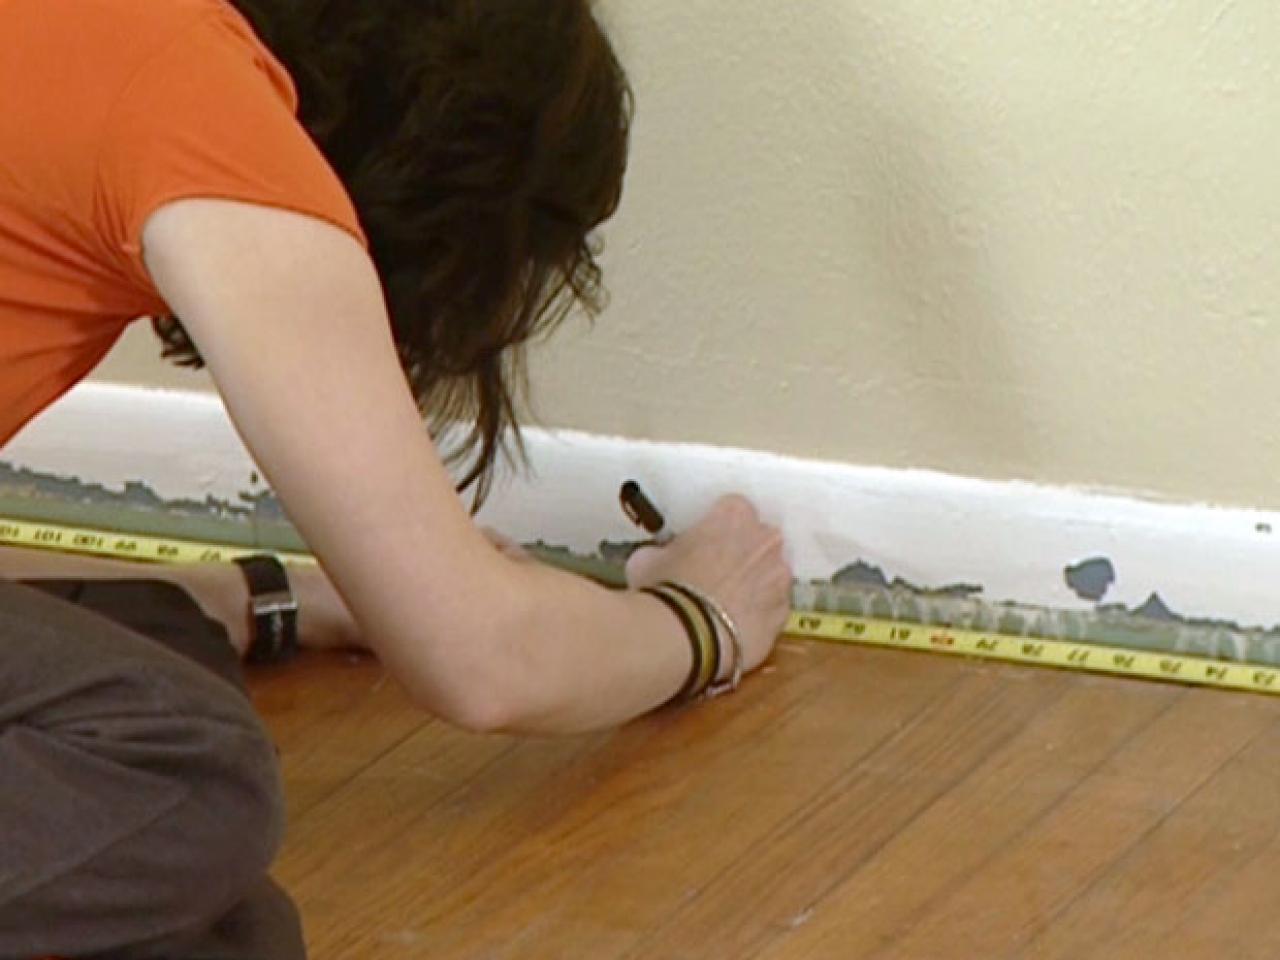 how to install carpet tiles hgtv. Black Bedroom Furniture Sets. Home Design Ideas